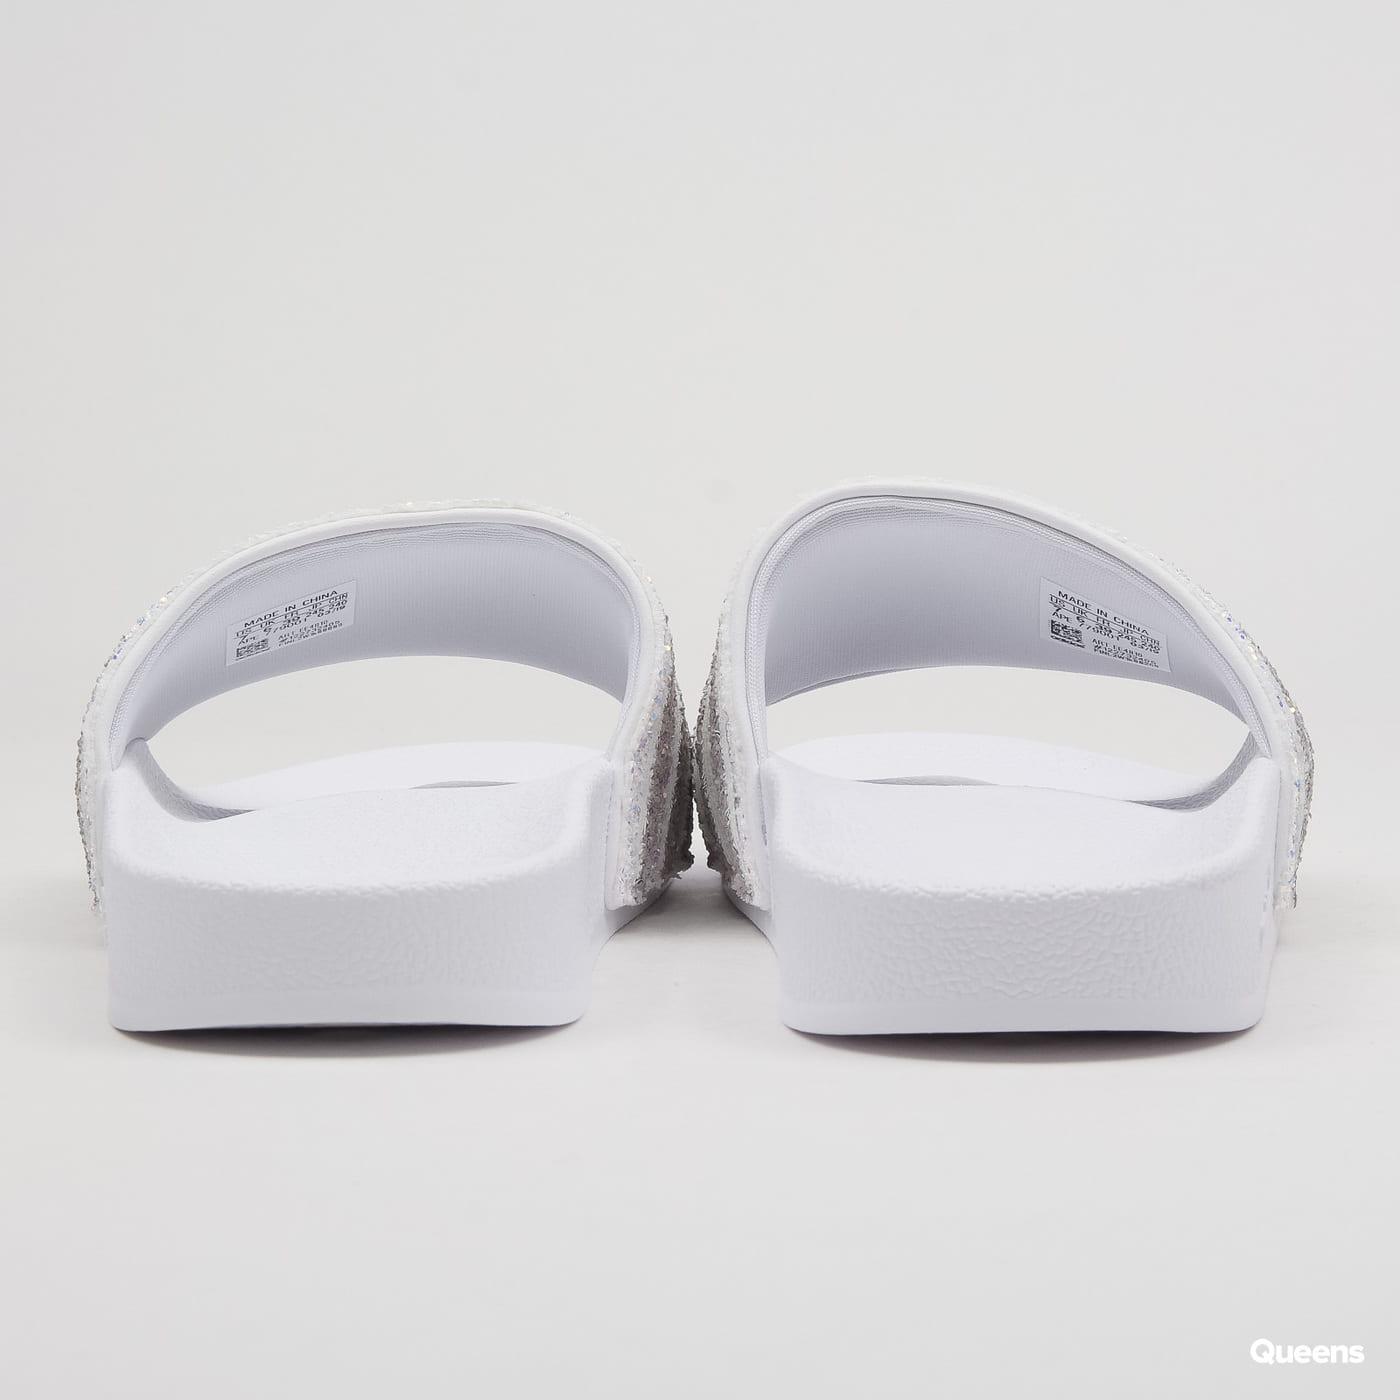 474b6b7921 Zväčšiť Zväčšiť Zväčšiť Zväčšiť Zväčšiť. adidas Originals Adilette W ftwwht    lgrani ...